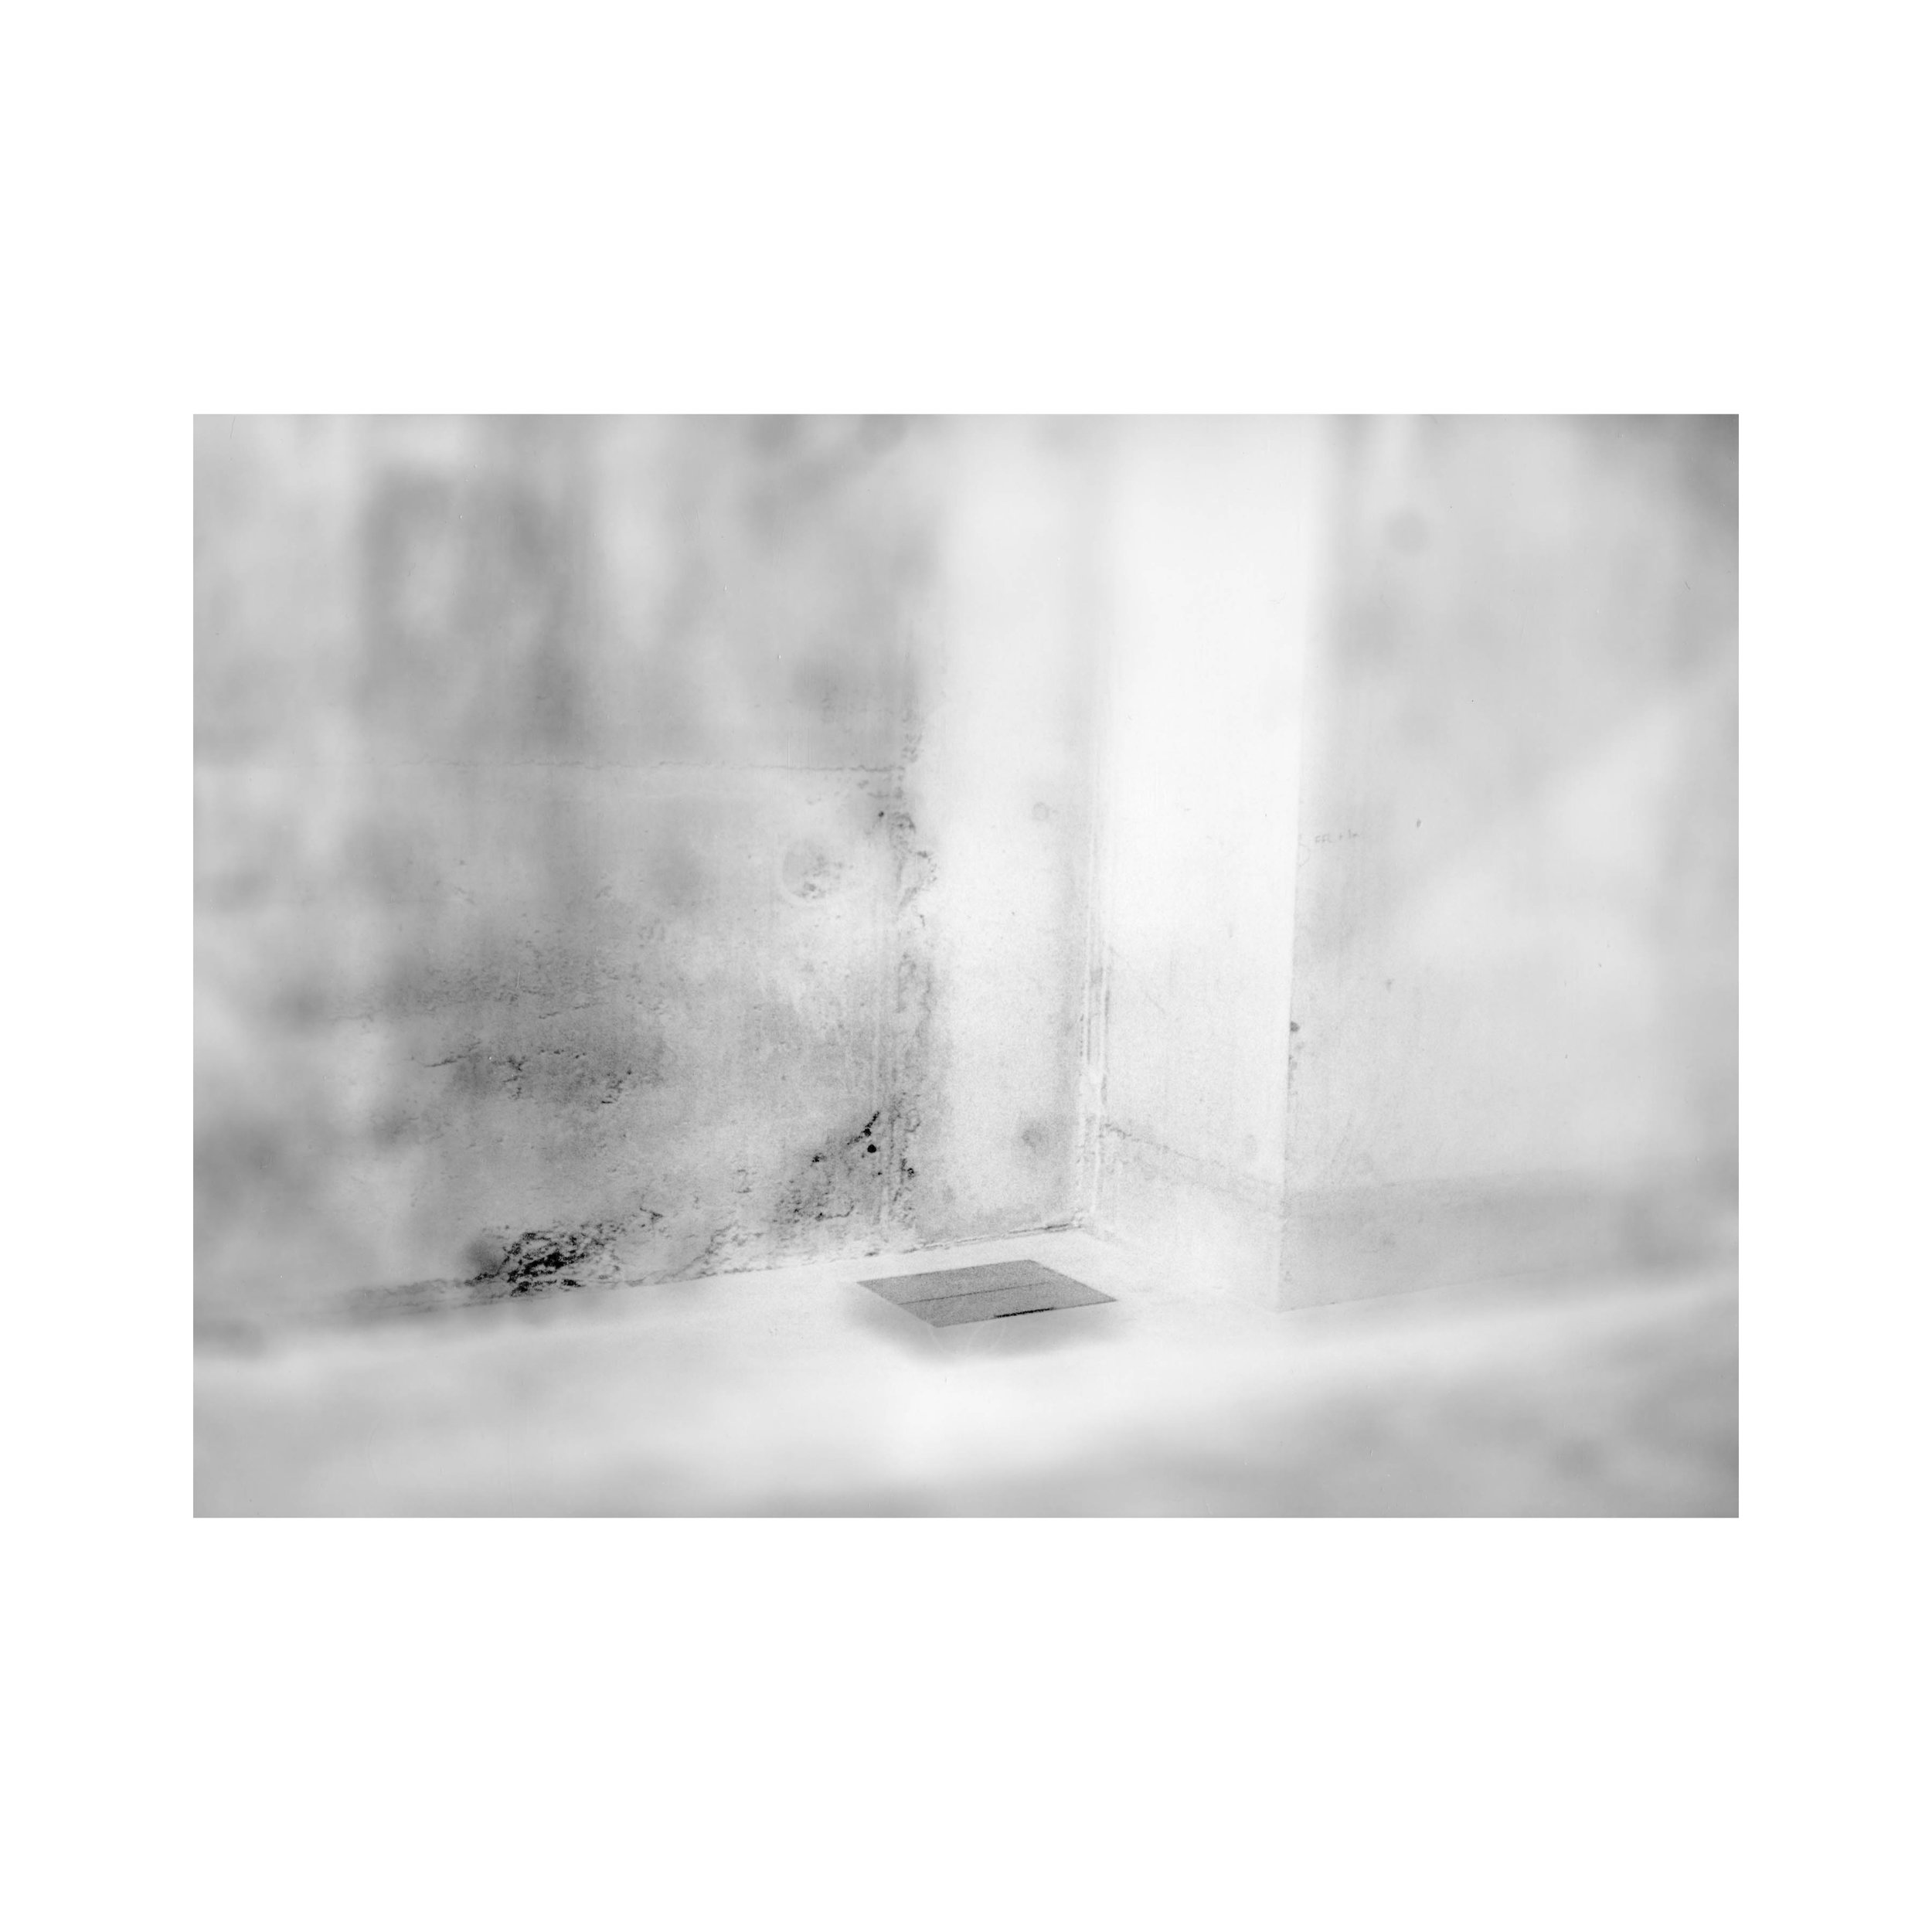 Square Watermarked-044.jpg